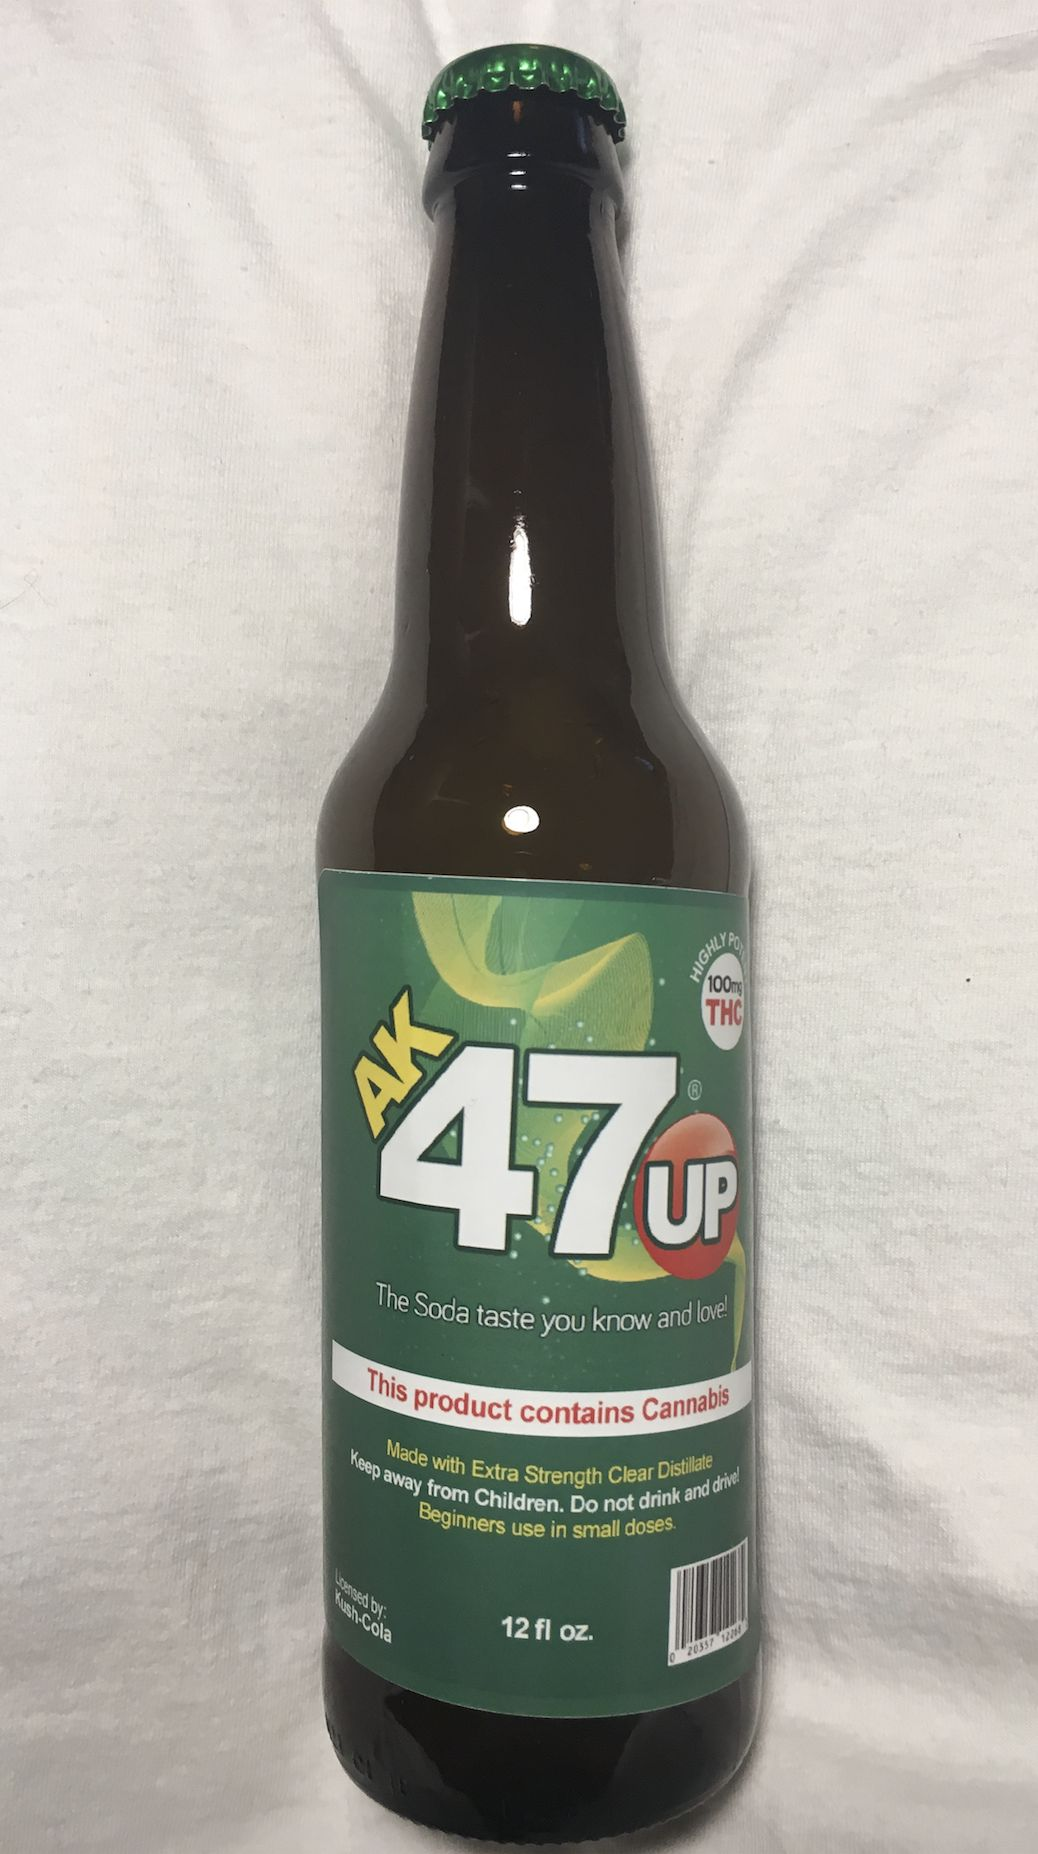 AK47Up 100mg Cannabis Distillate Lemon Lime Soda